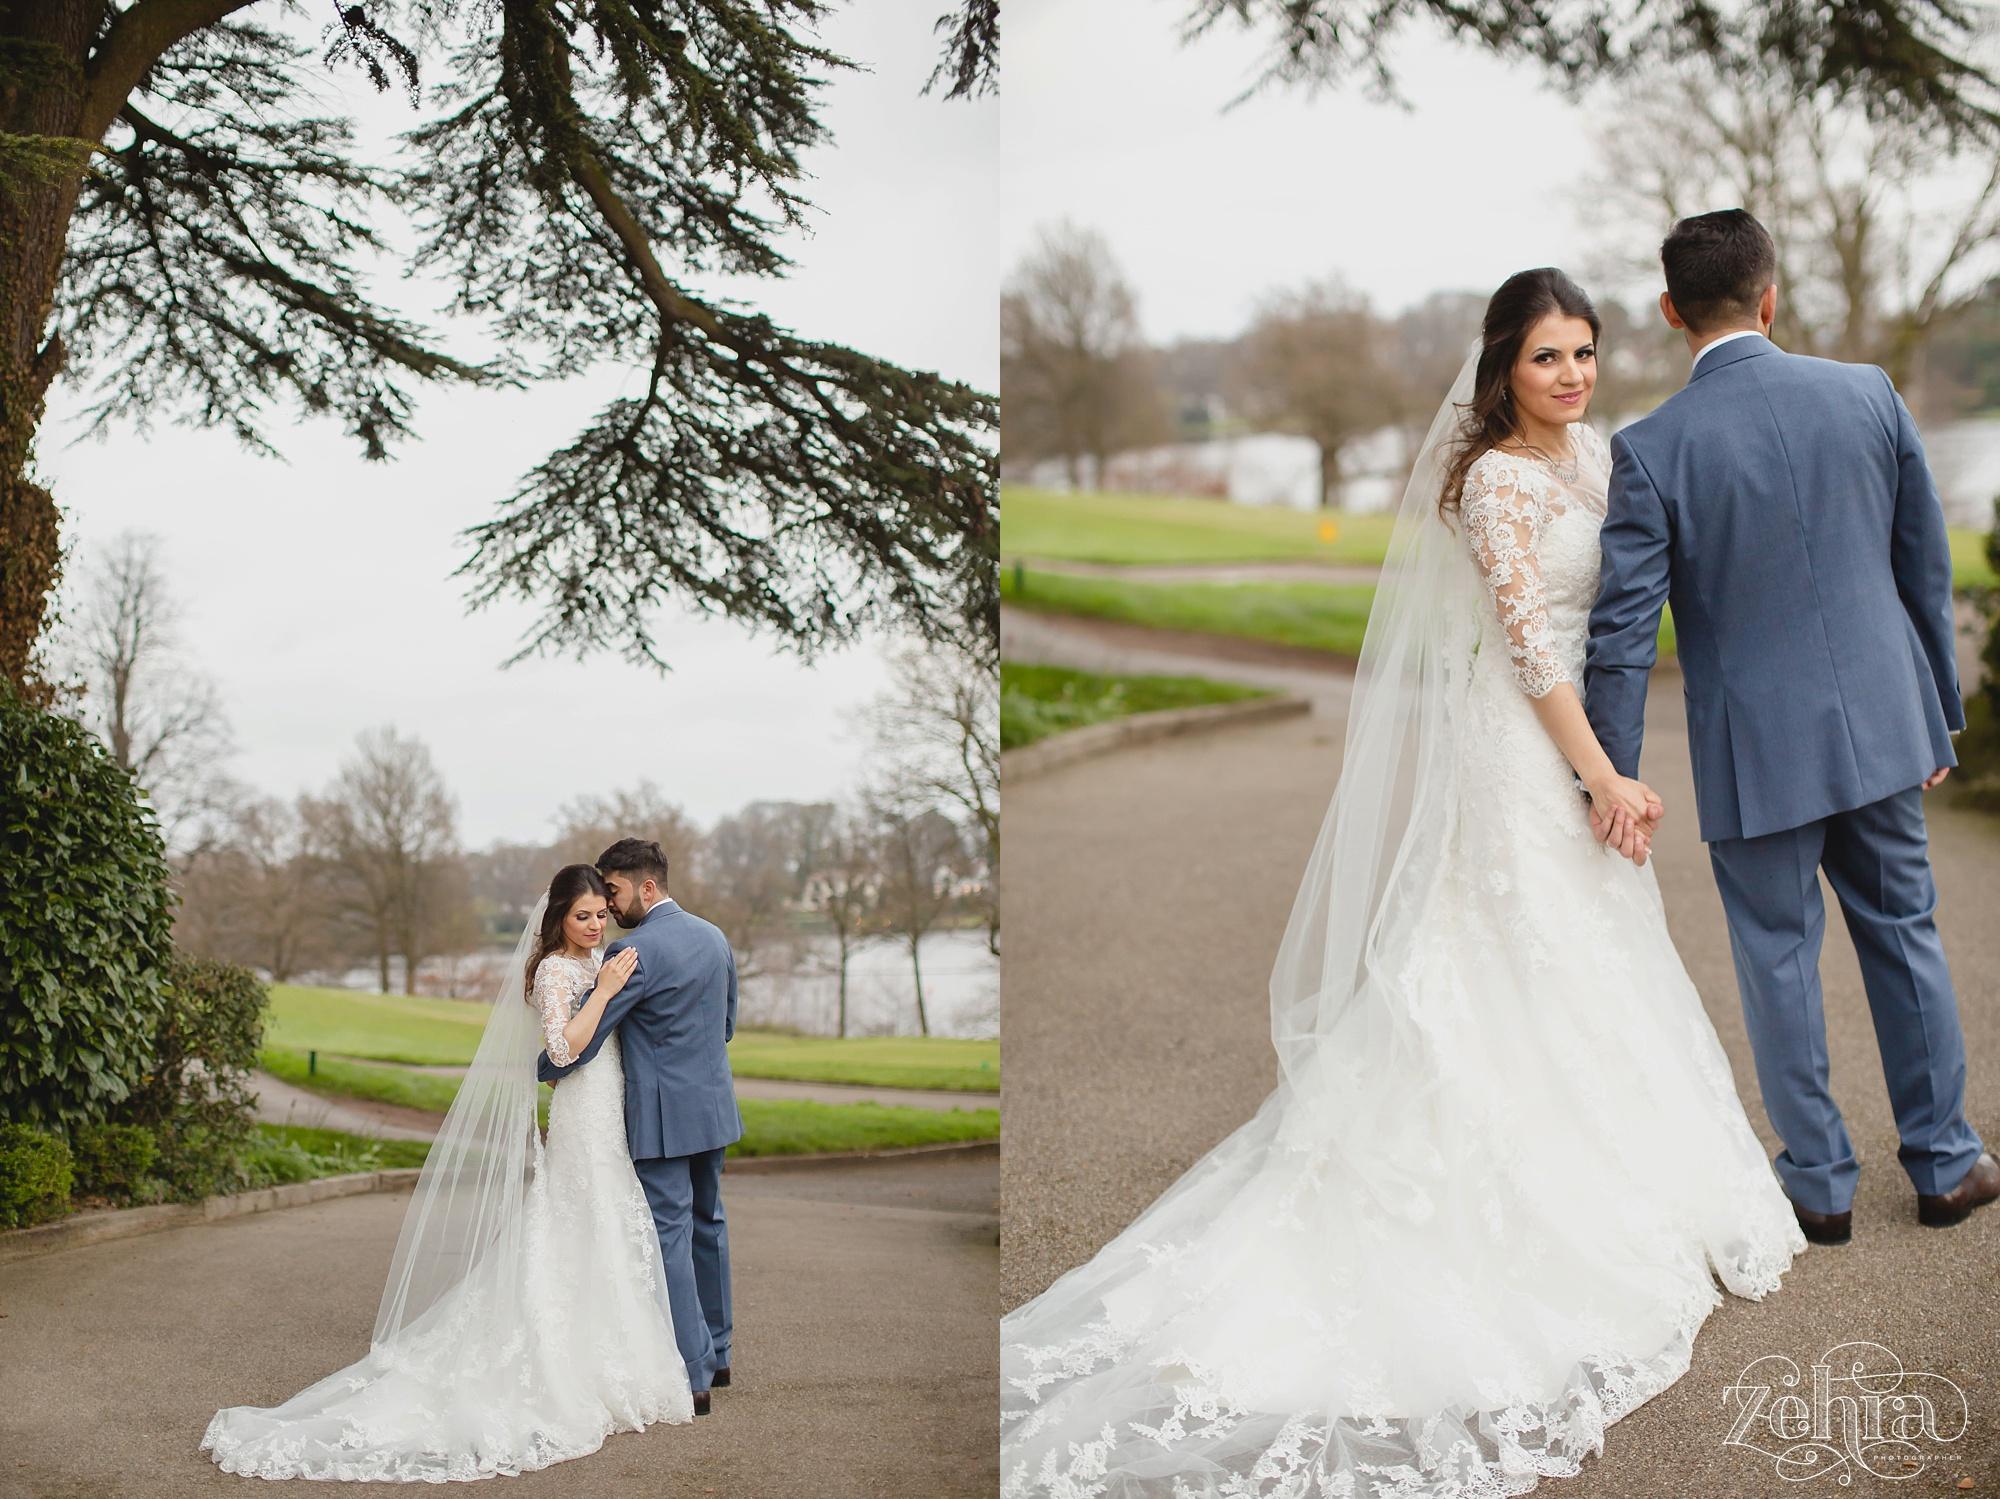 zehra photographer mere cheshire wedding_0047.jpg